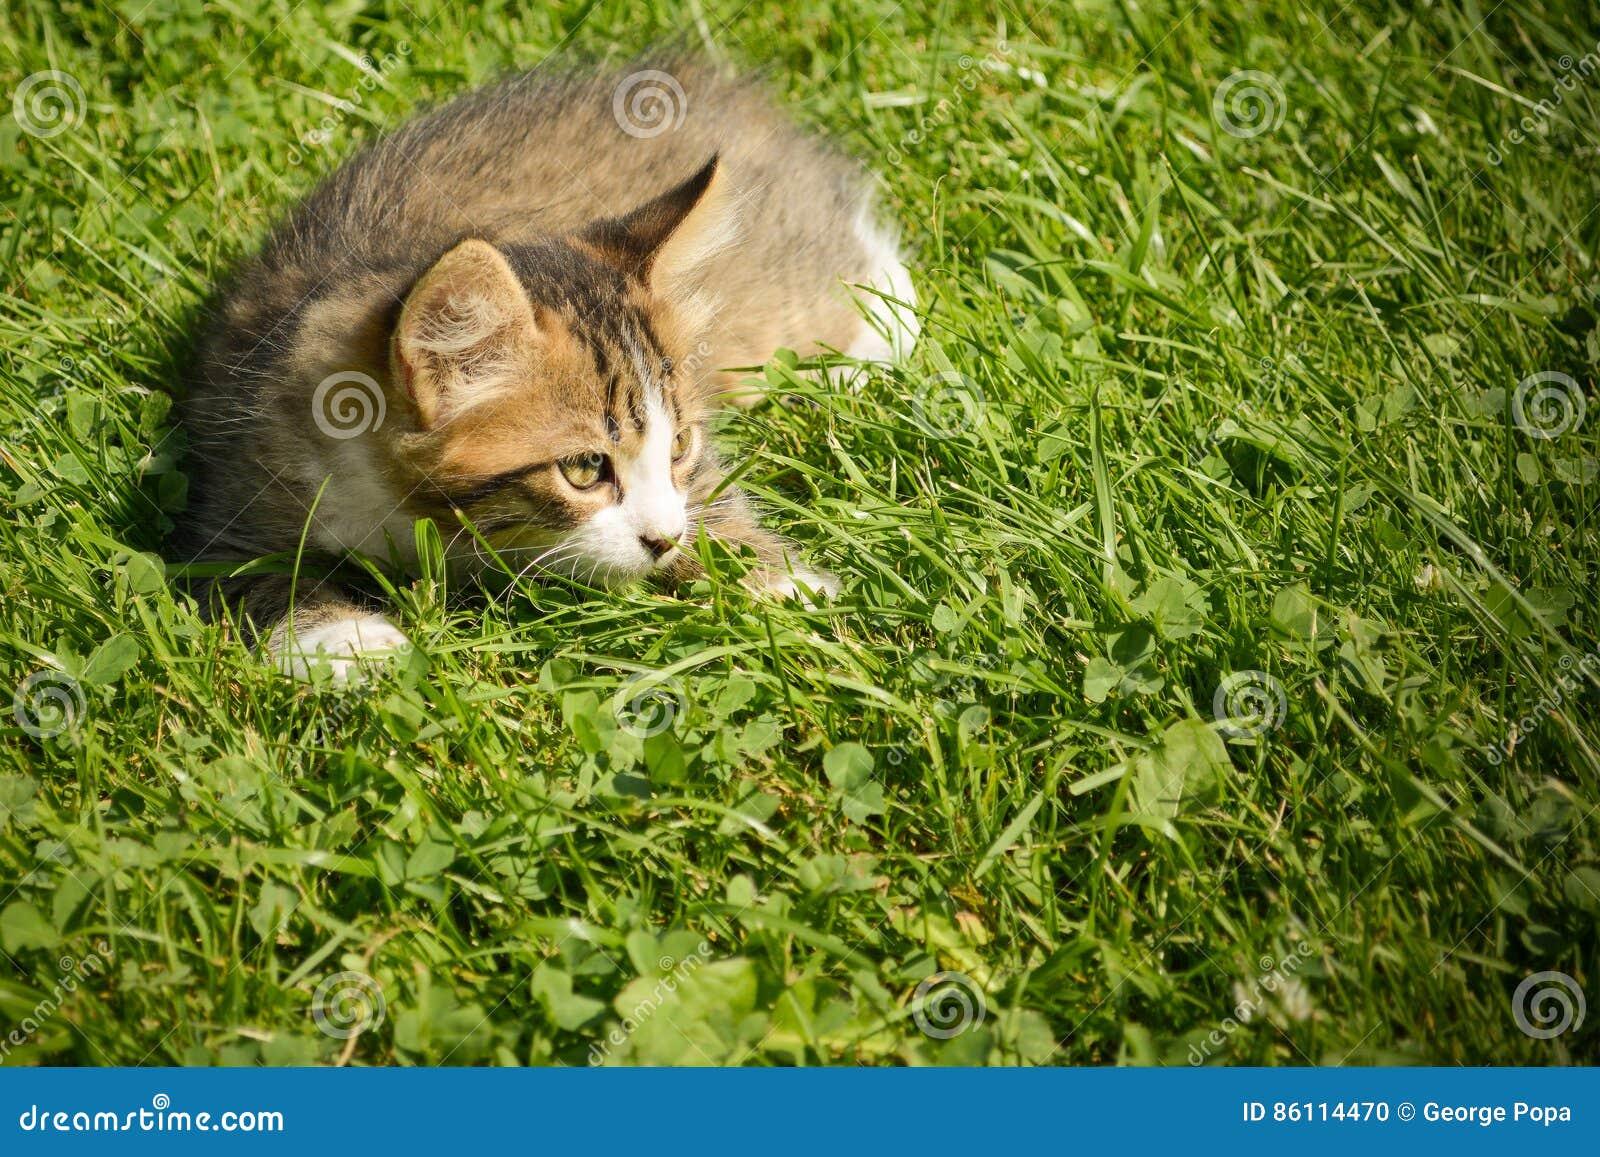 petit chat jouant dans l 39 herbe photo stock image du visage vert 86114470. Black Bedroom Furniture Sets. Home Design Ideas